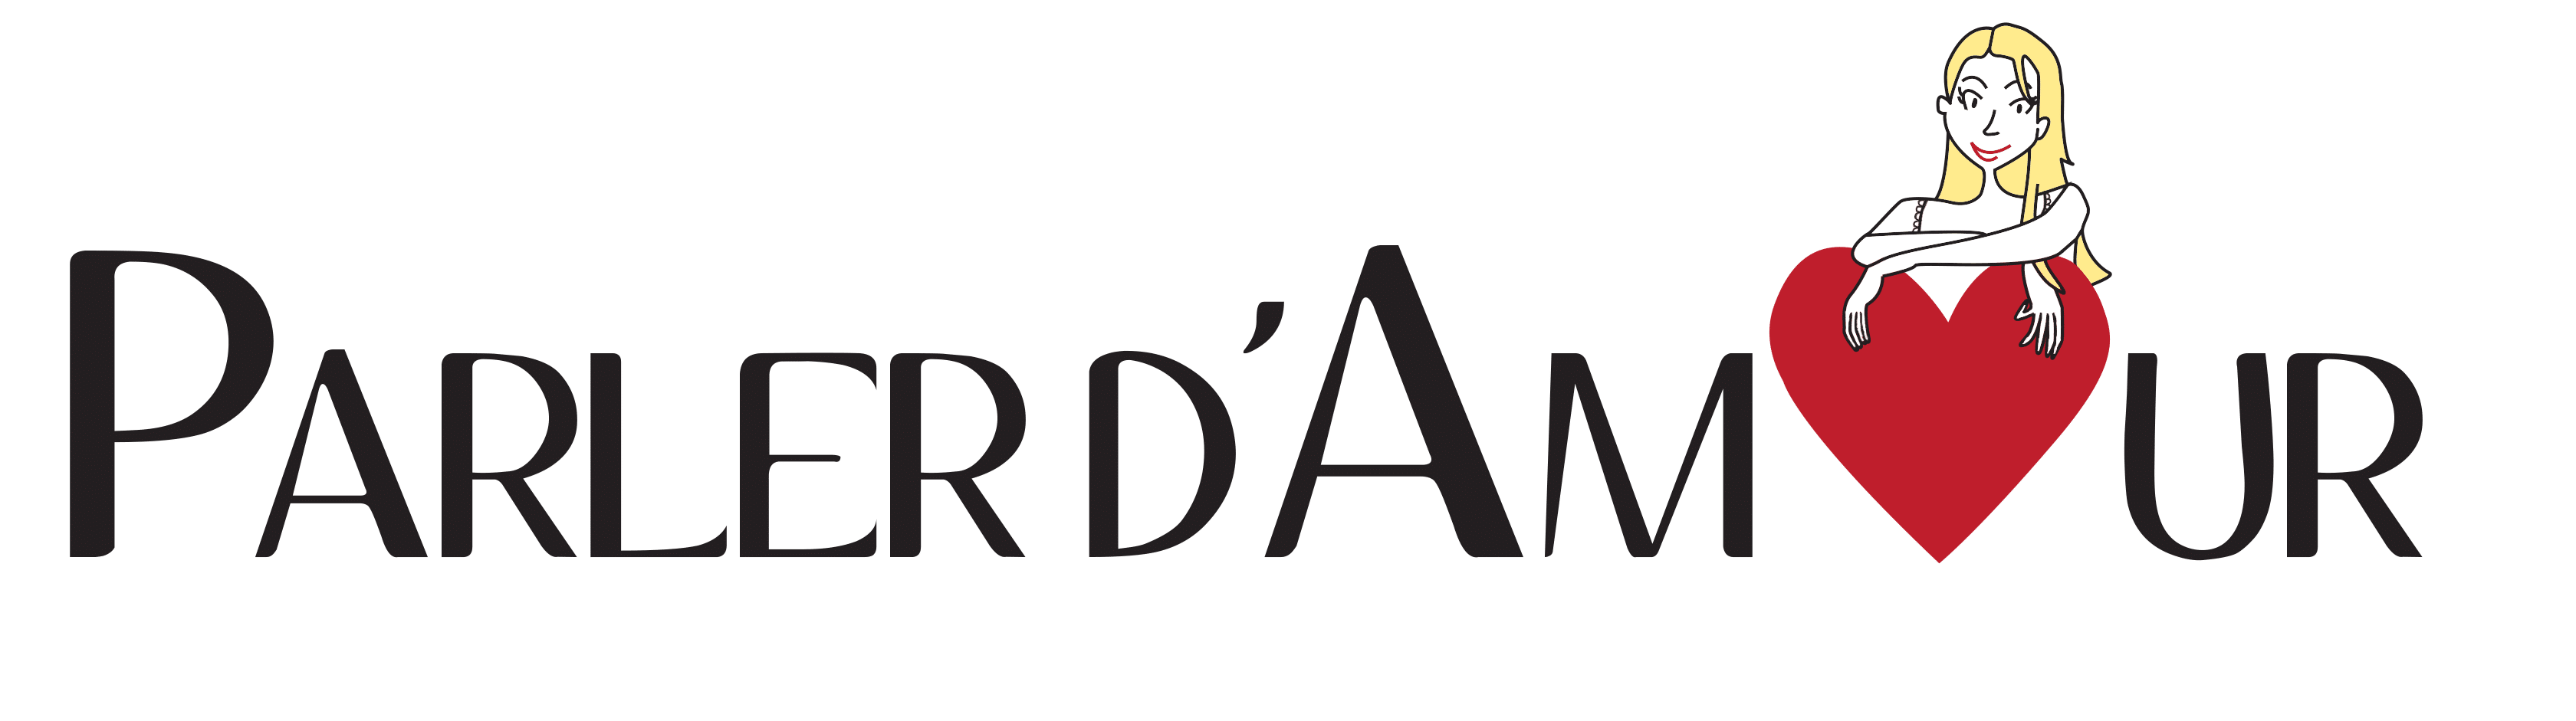 ParlerdAmour-logo-final